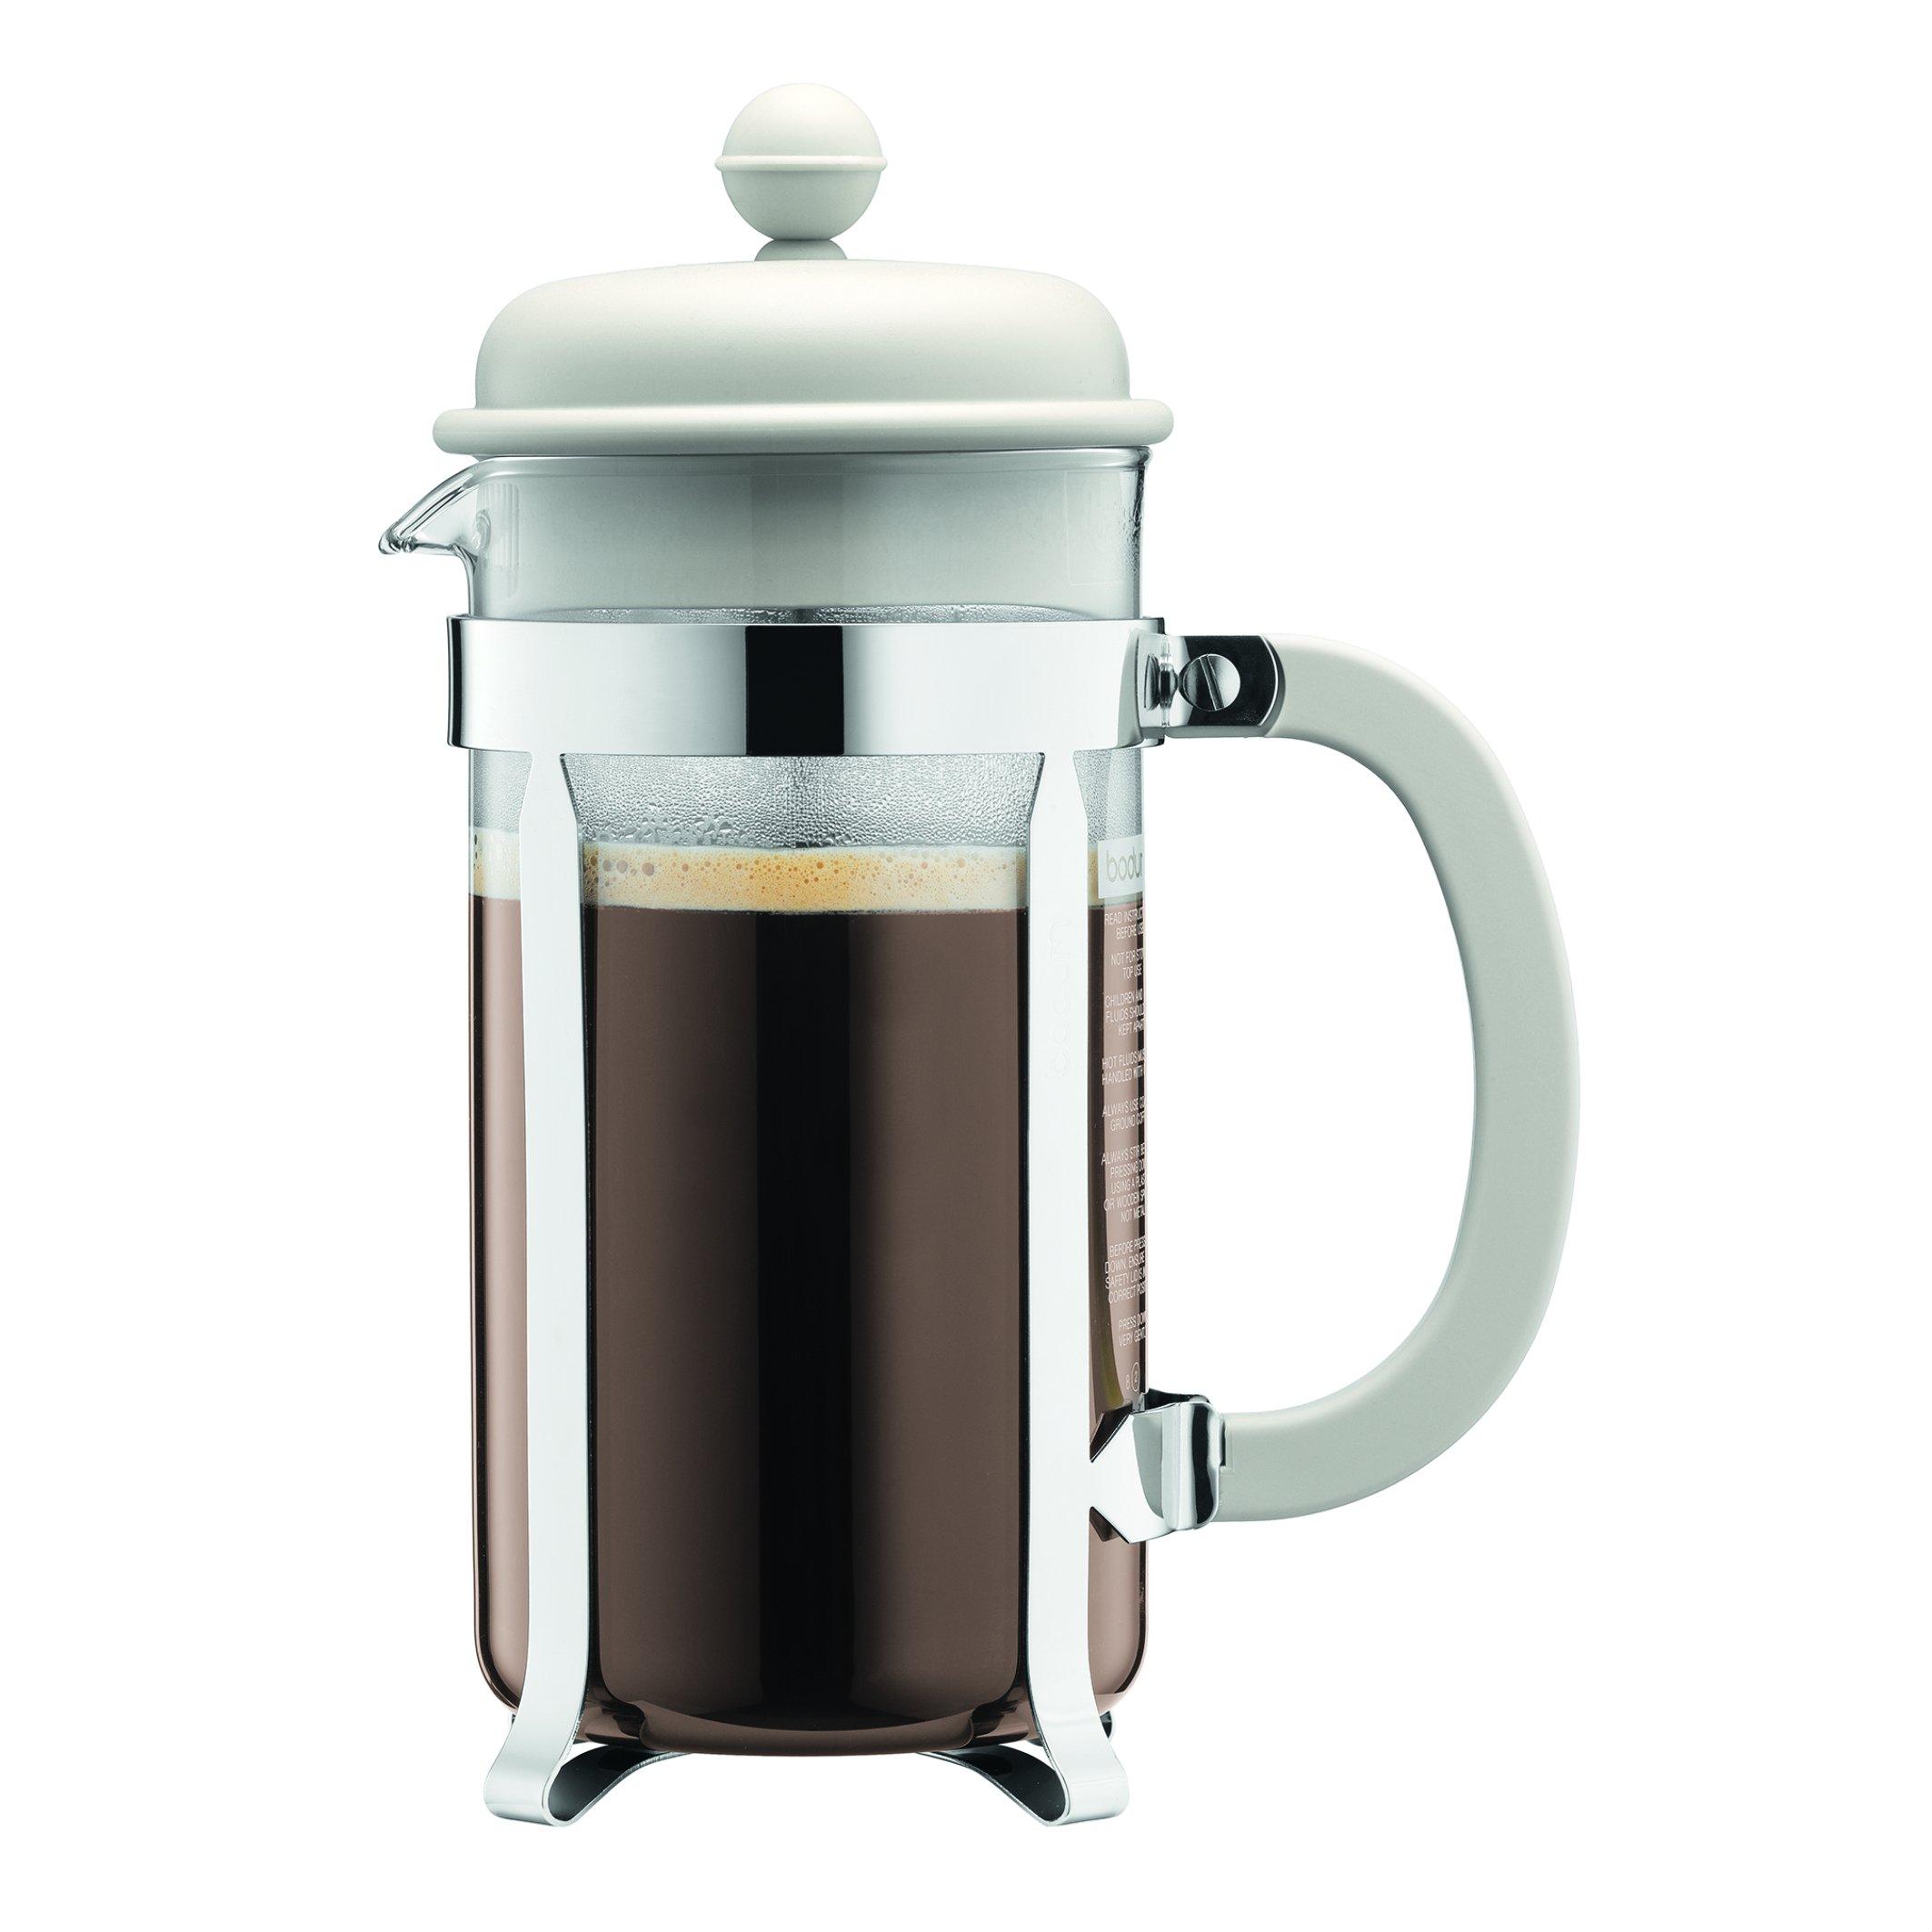 Bodum Caffettiera 1-Liter 8-Cup Coffee Maker, 34-Ounce, Off-White